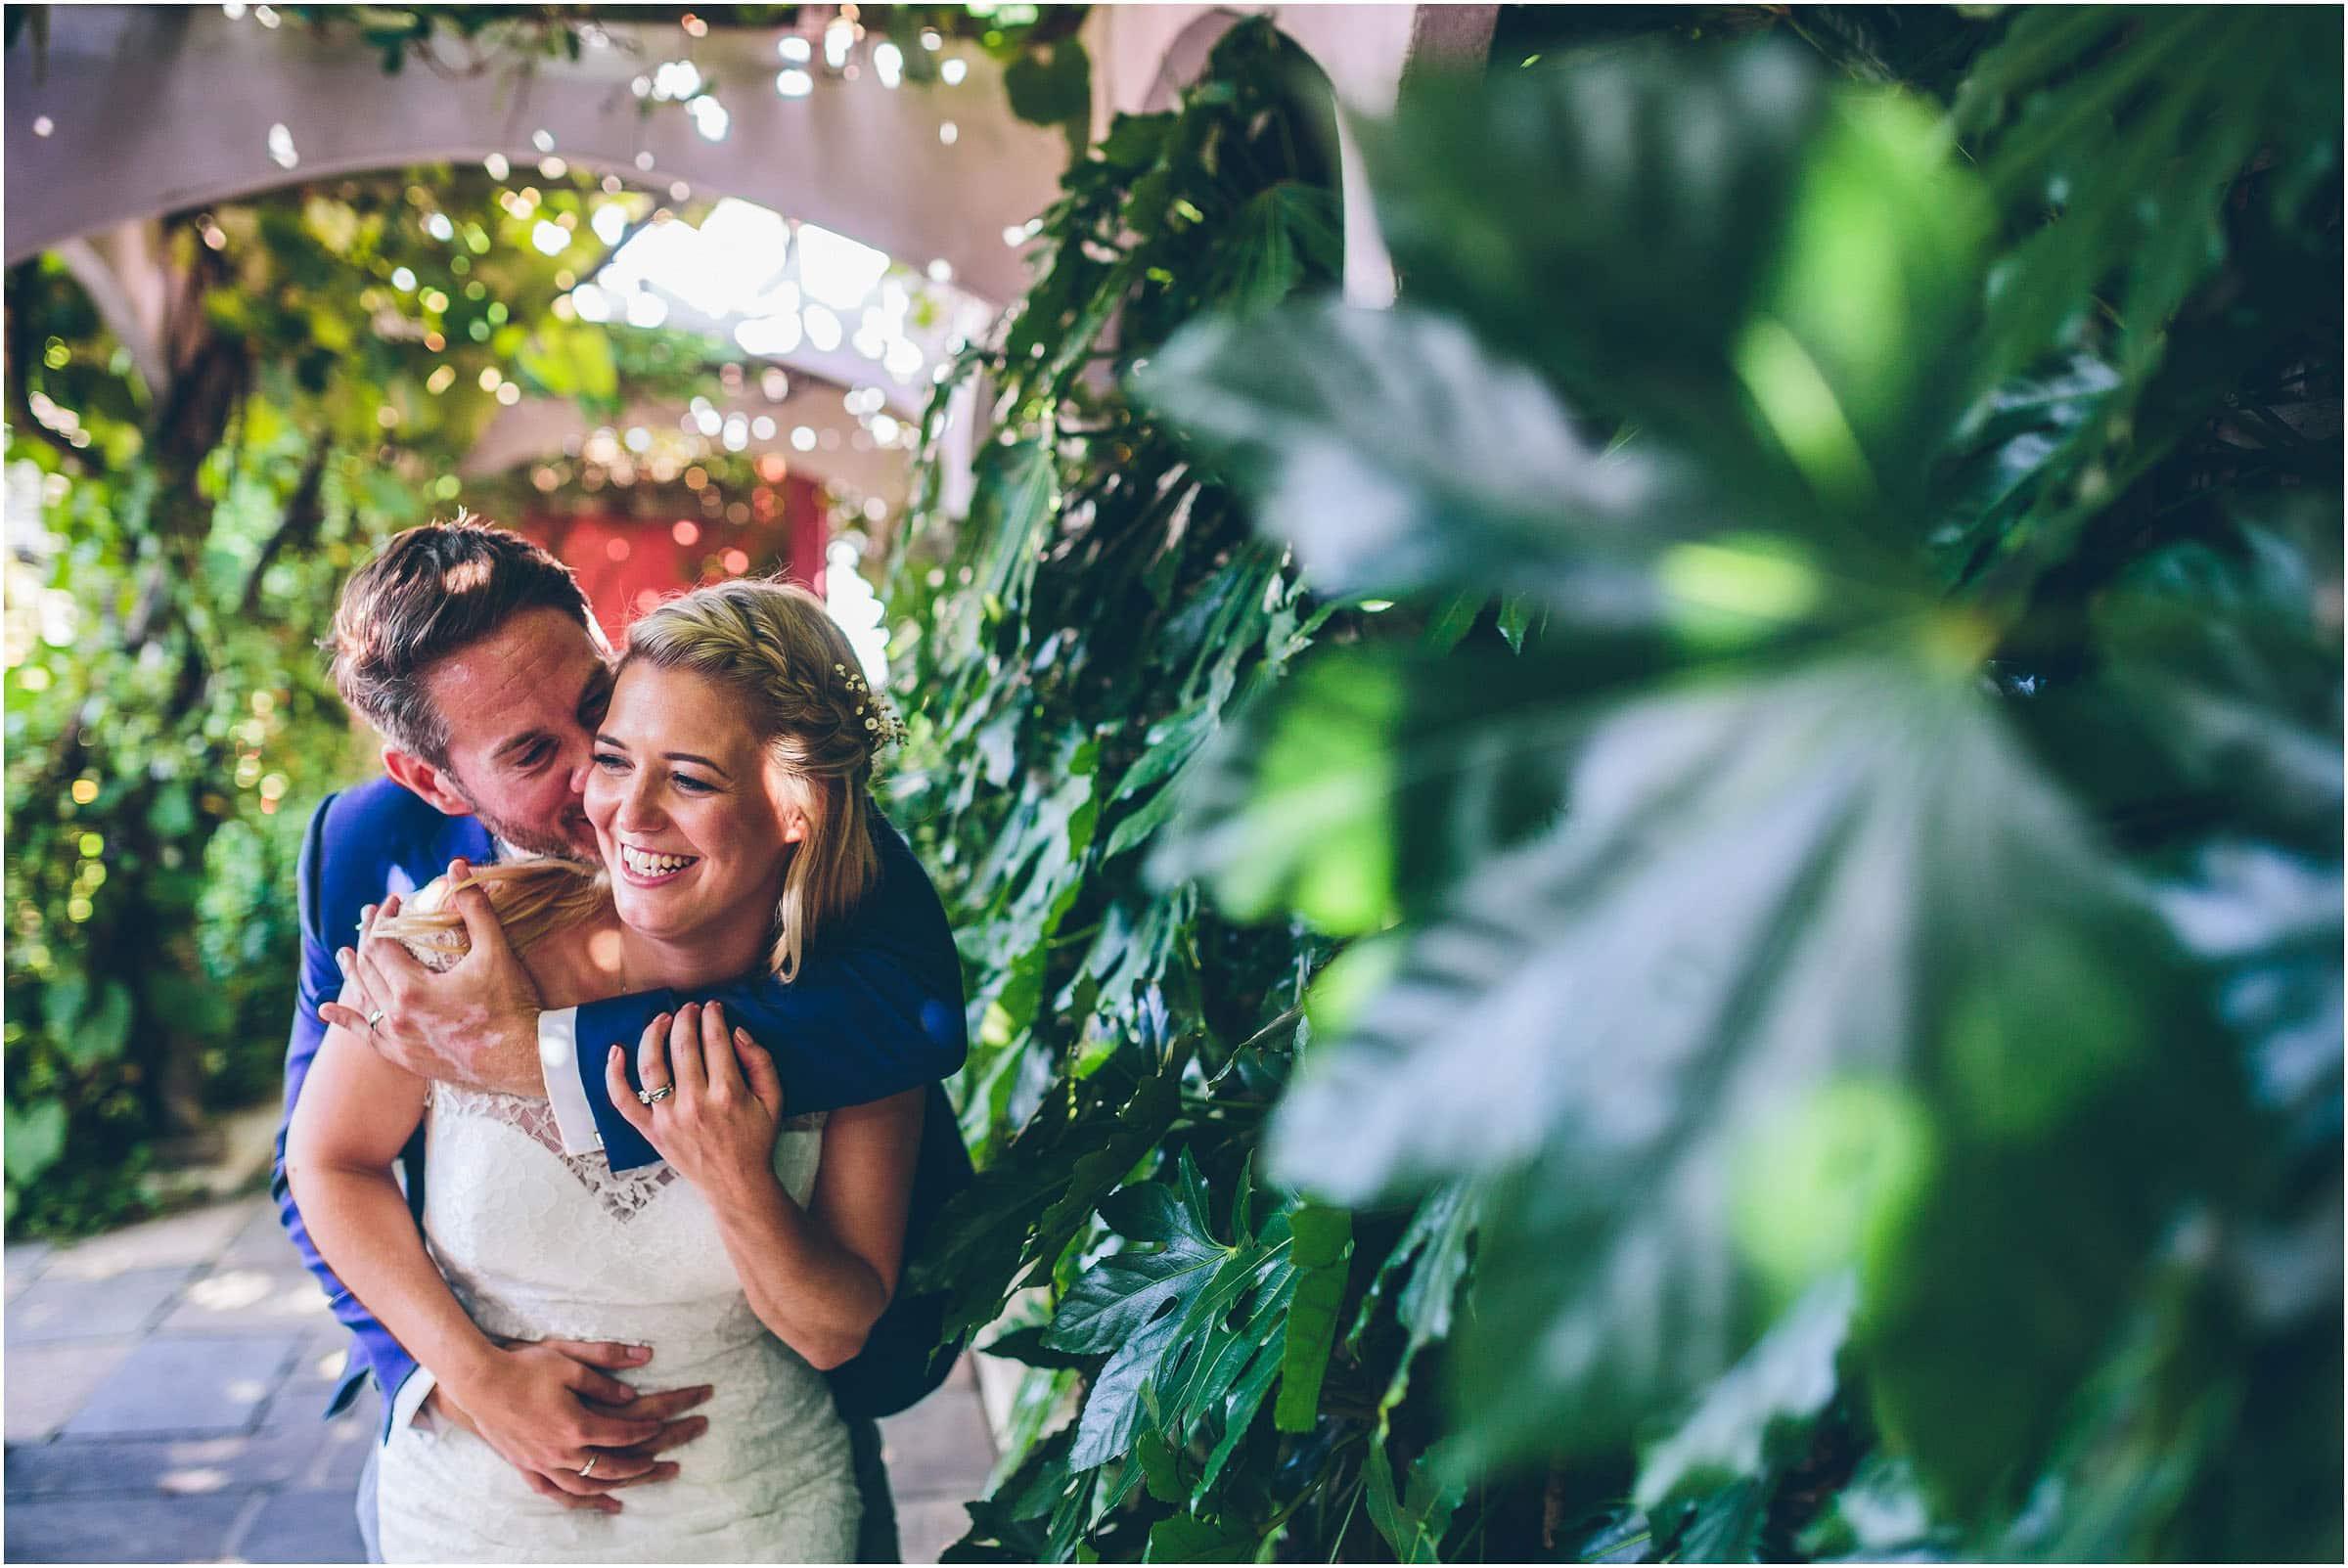 Kensington_Roof_Gardens_Wedding_Photography_0058